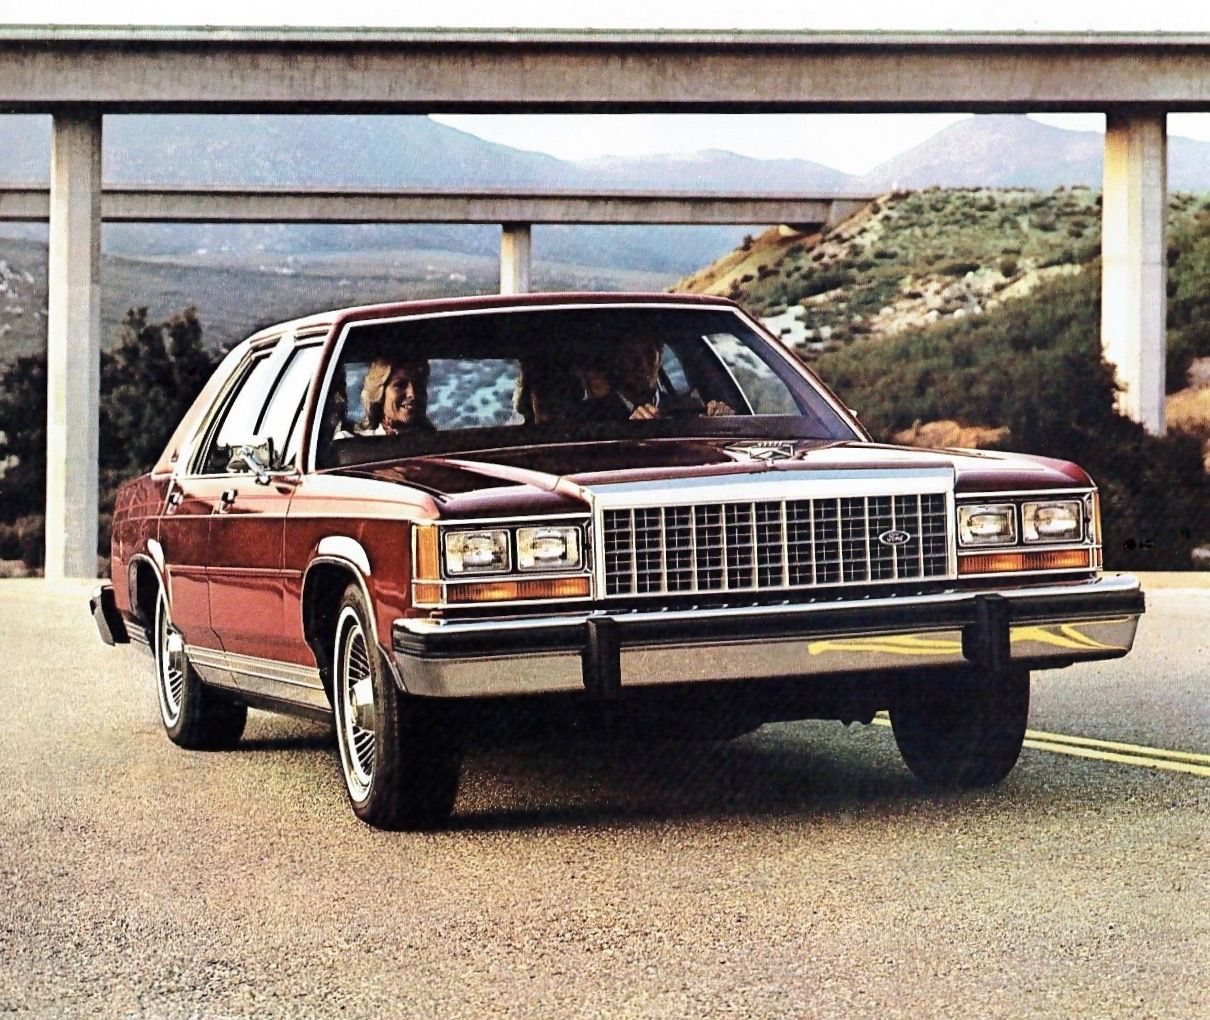 1985 Ford Ltd Crown Victoria Ford Ltd American Classic Cars Ford